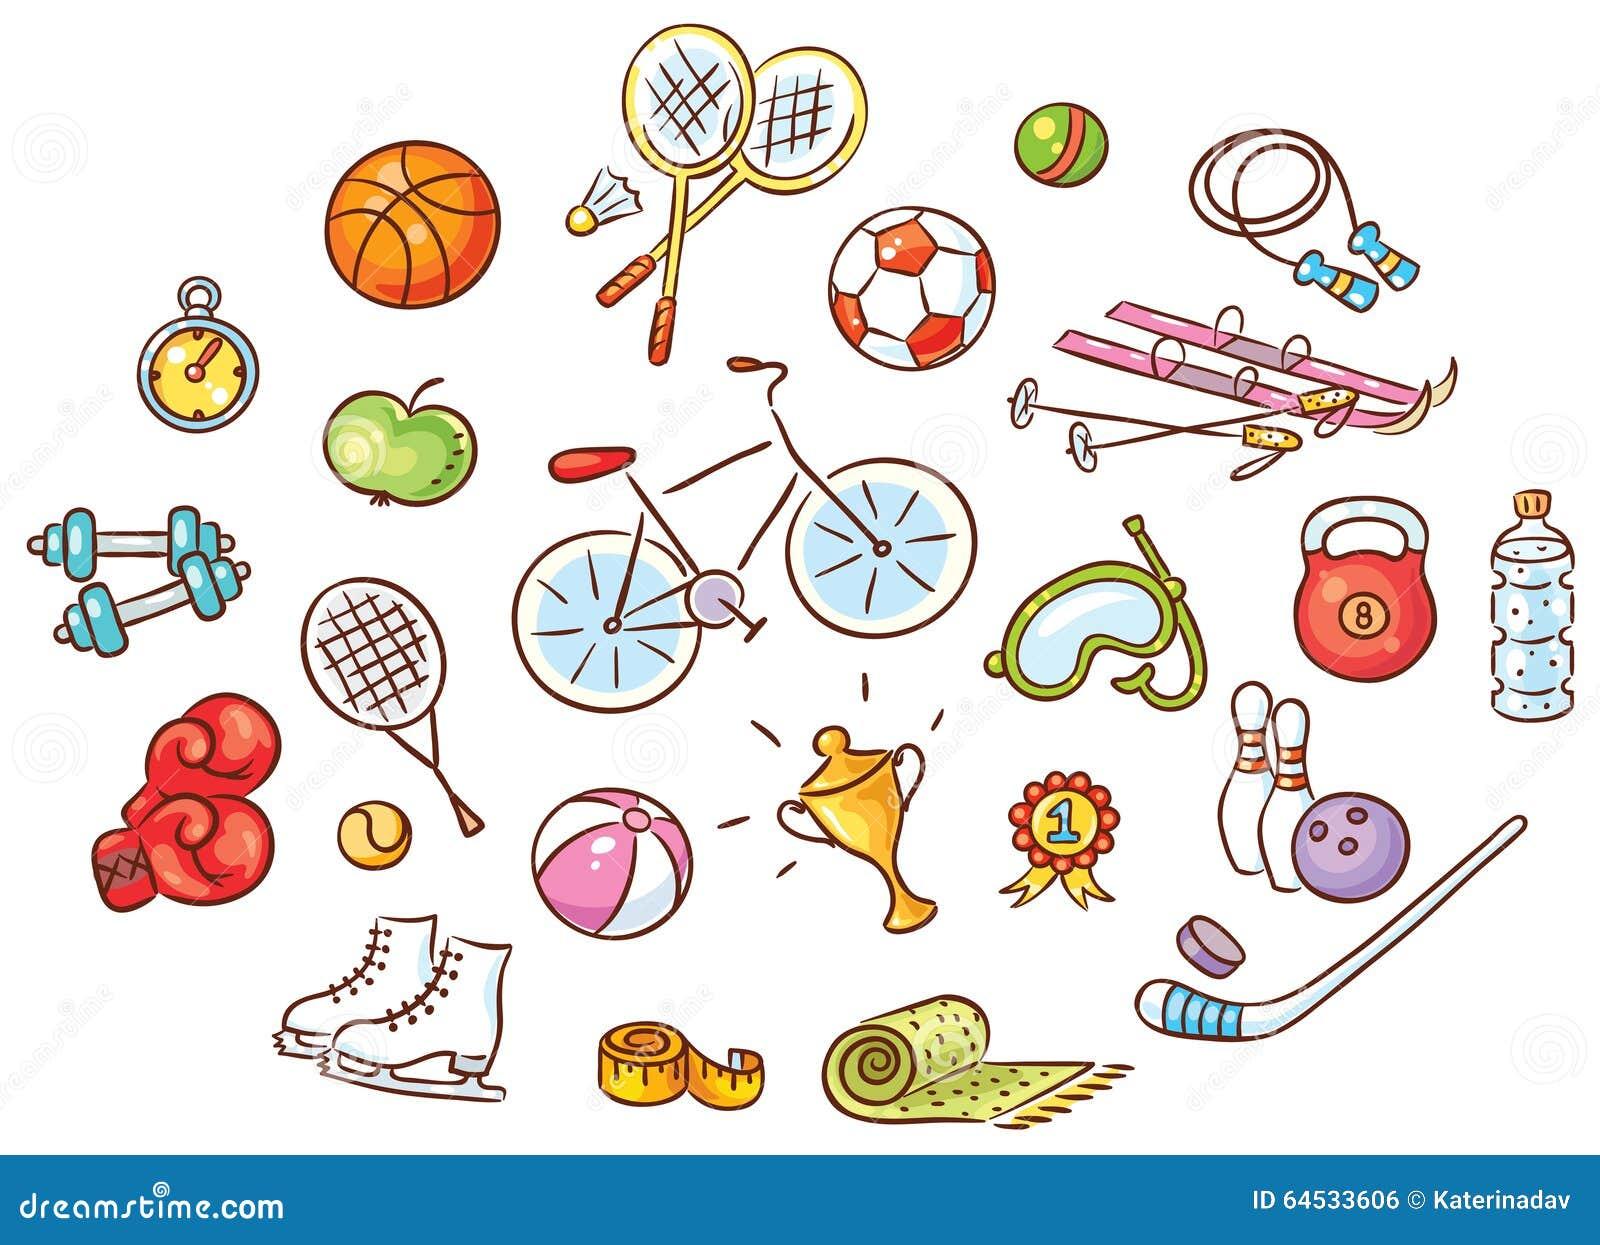 Summer Sports Cartoon: Set Of Colorful Cartoon Sport Things Stock Vector